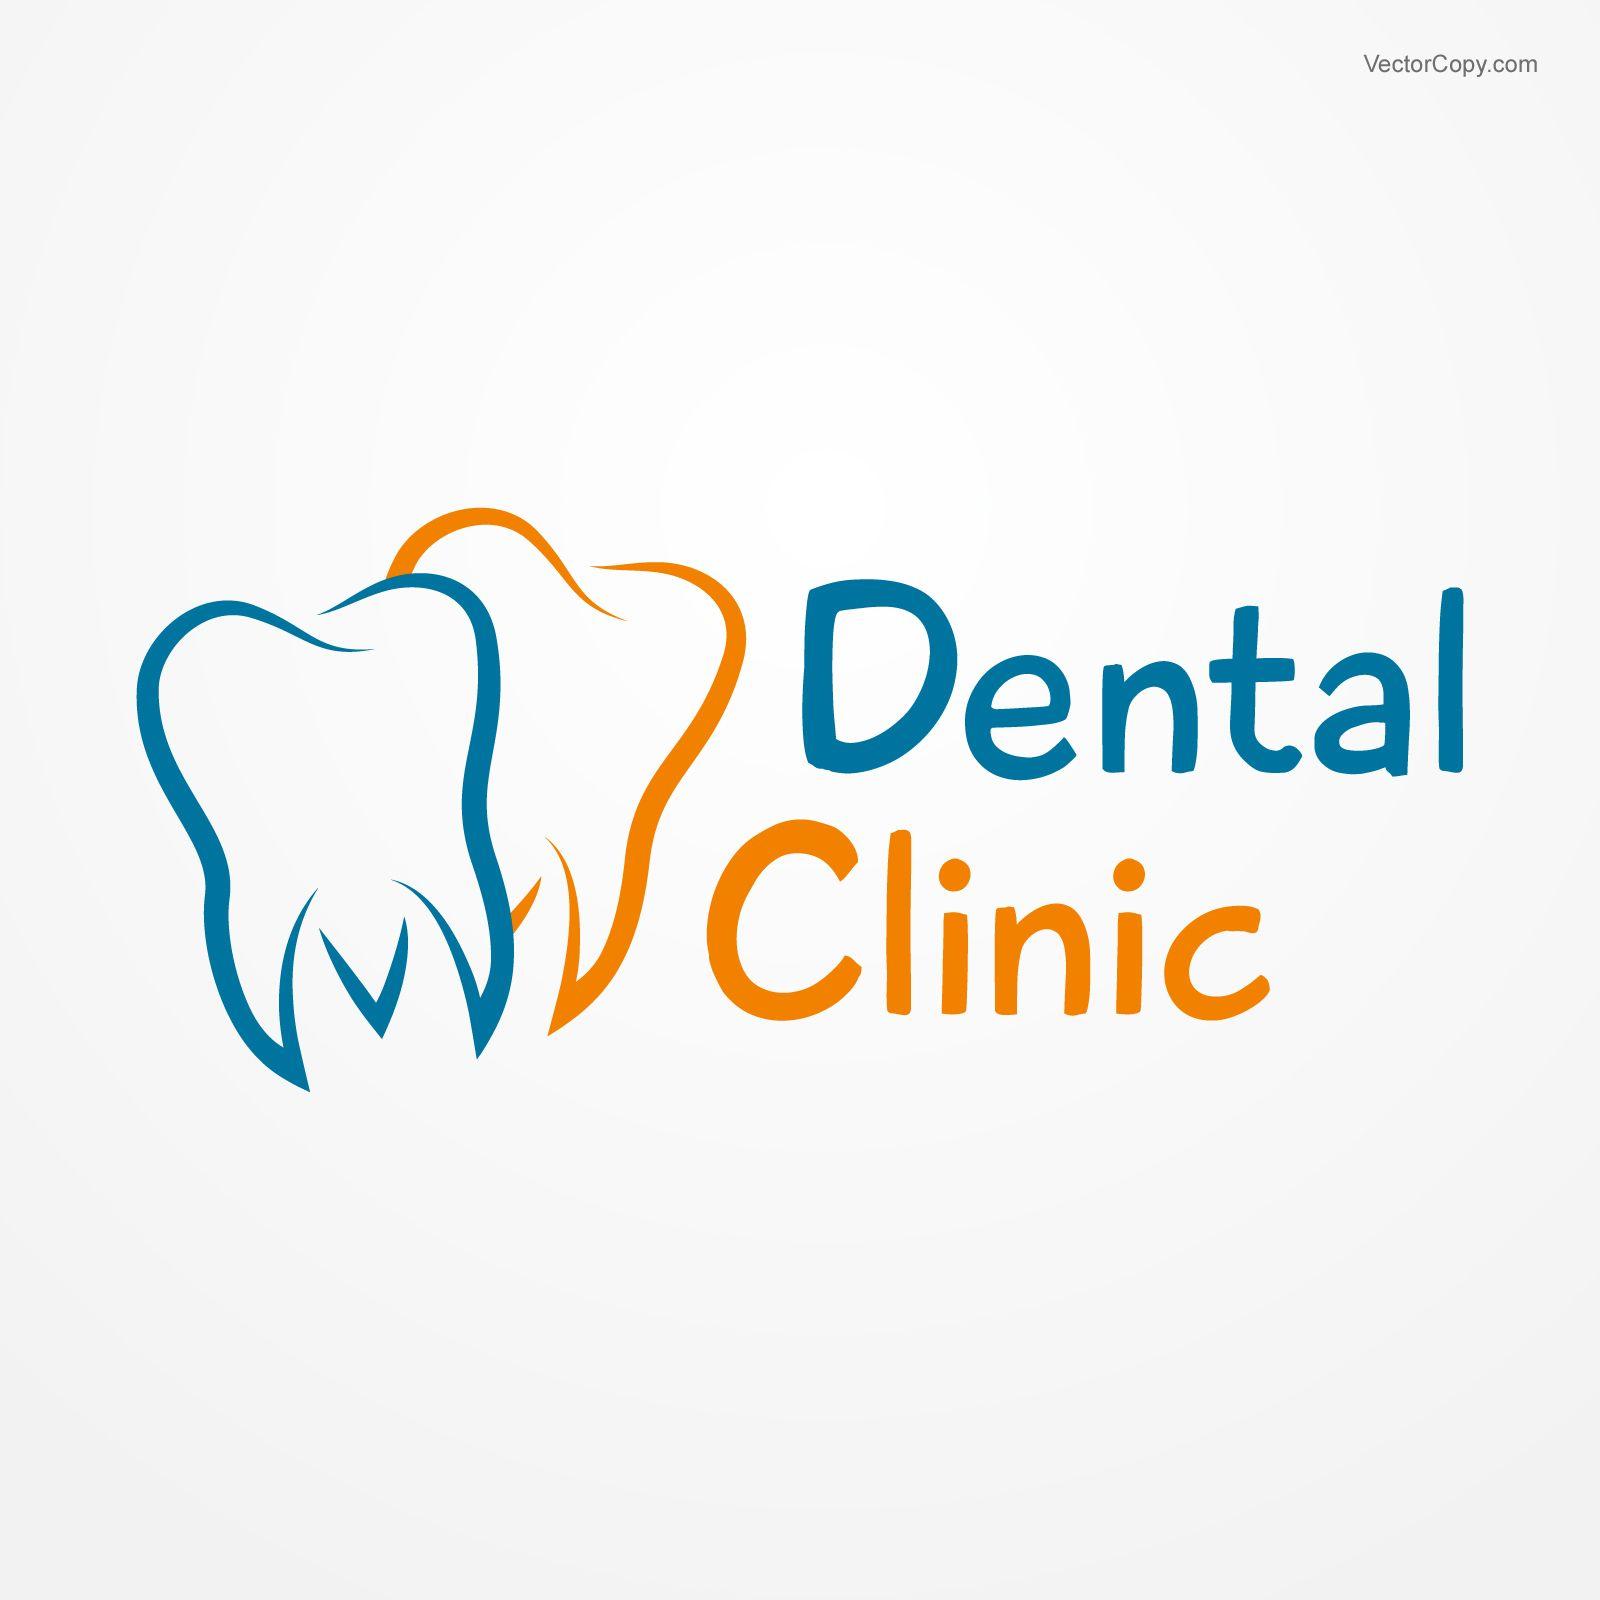 graphic free library Vector dental surgery symbol. Clinic logo free vectorart